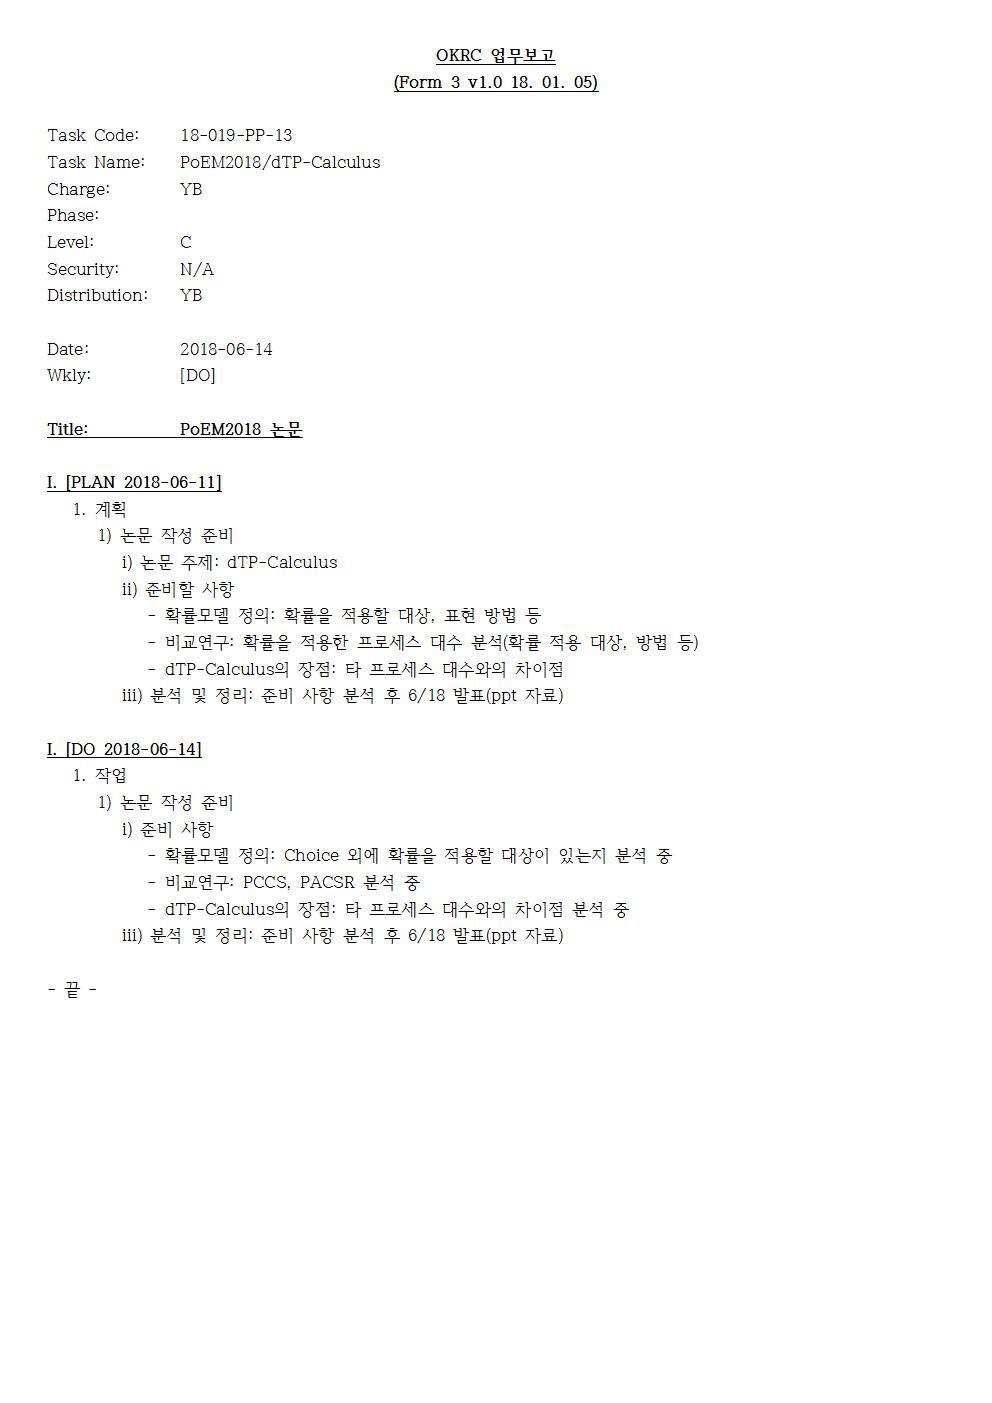 D-[18-019-PP-13]-[POEM]-[2018-06-14][YB]001.jpg